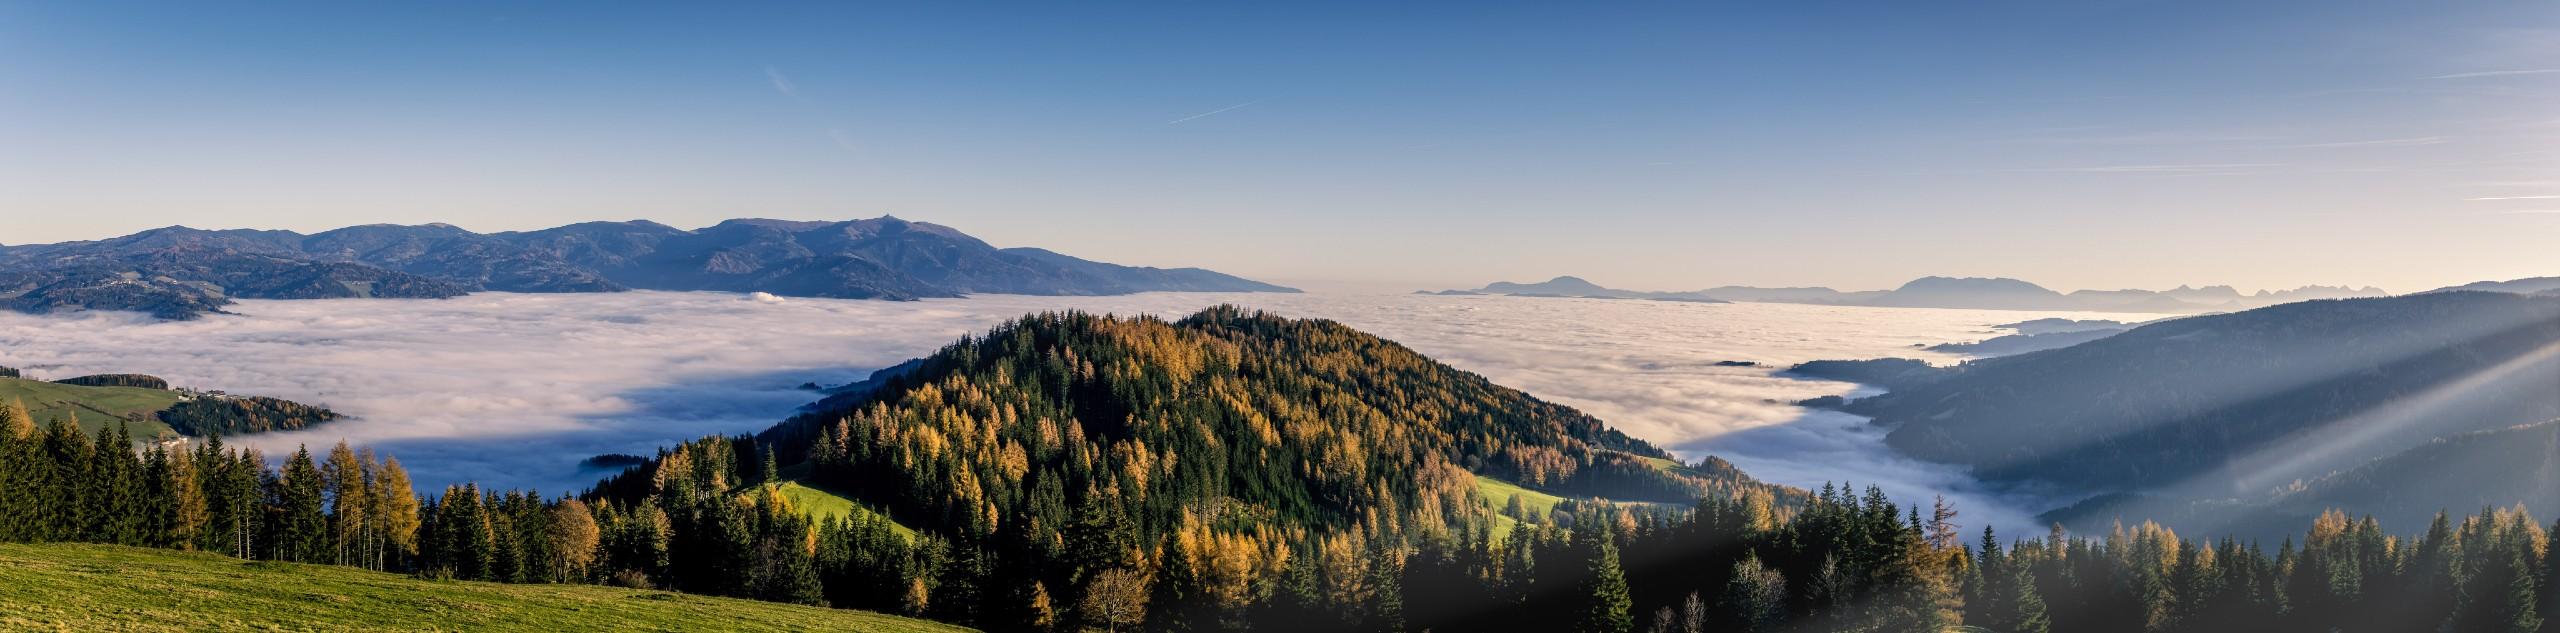 Mountain views in Carinthia (Austria)